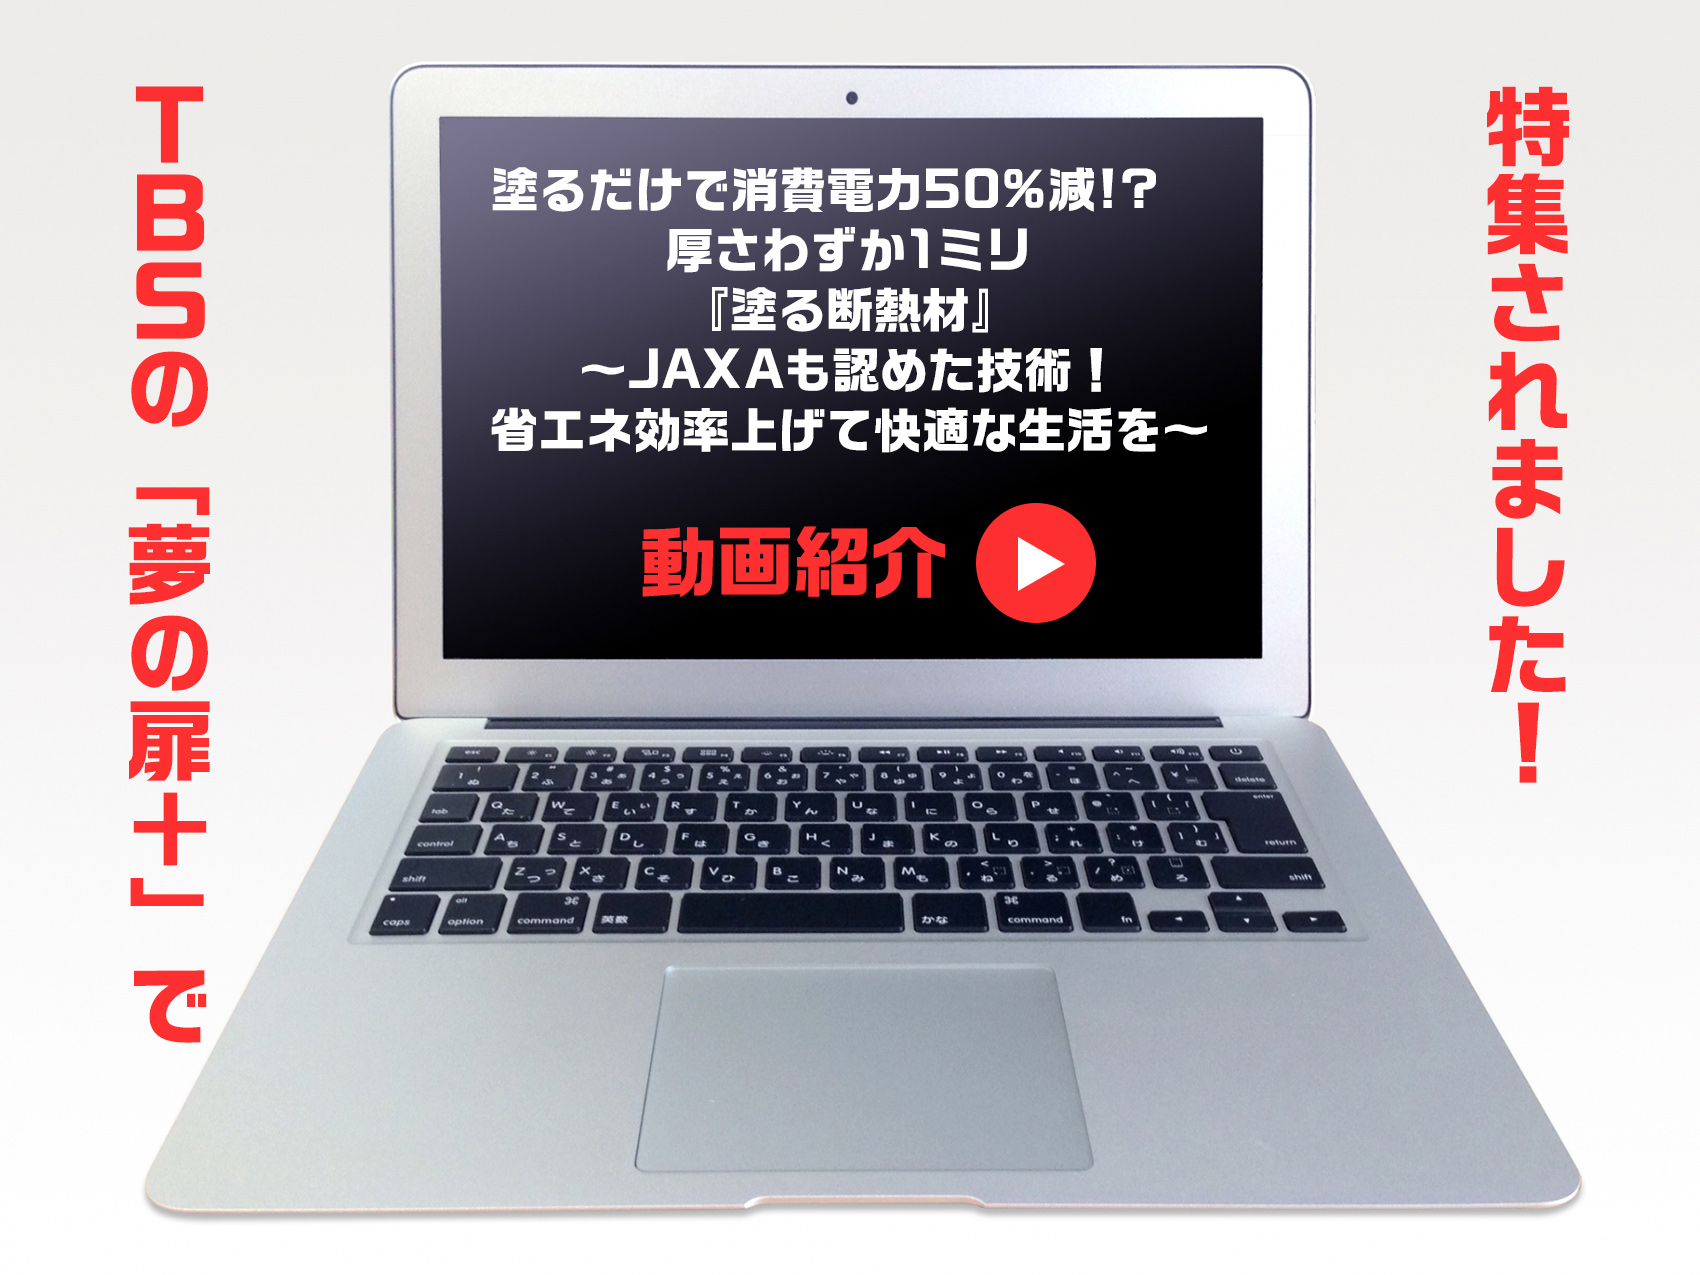 TBS夢の扉+ 断熱塗装GAINA